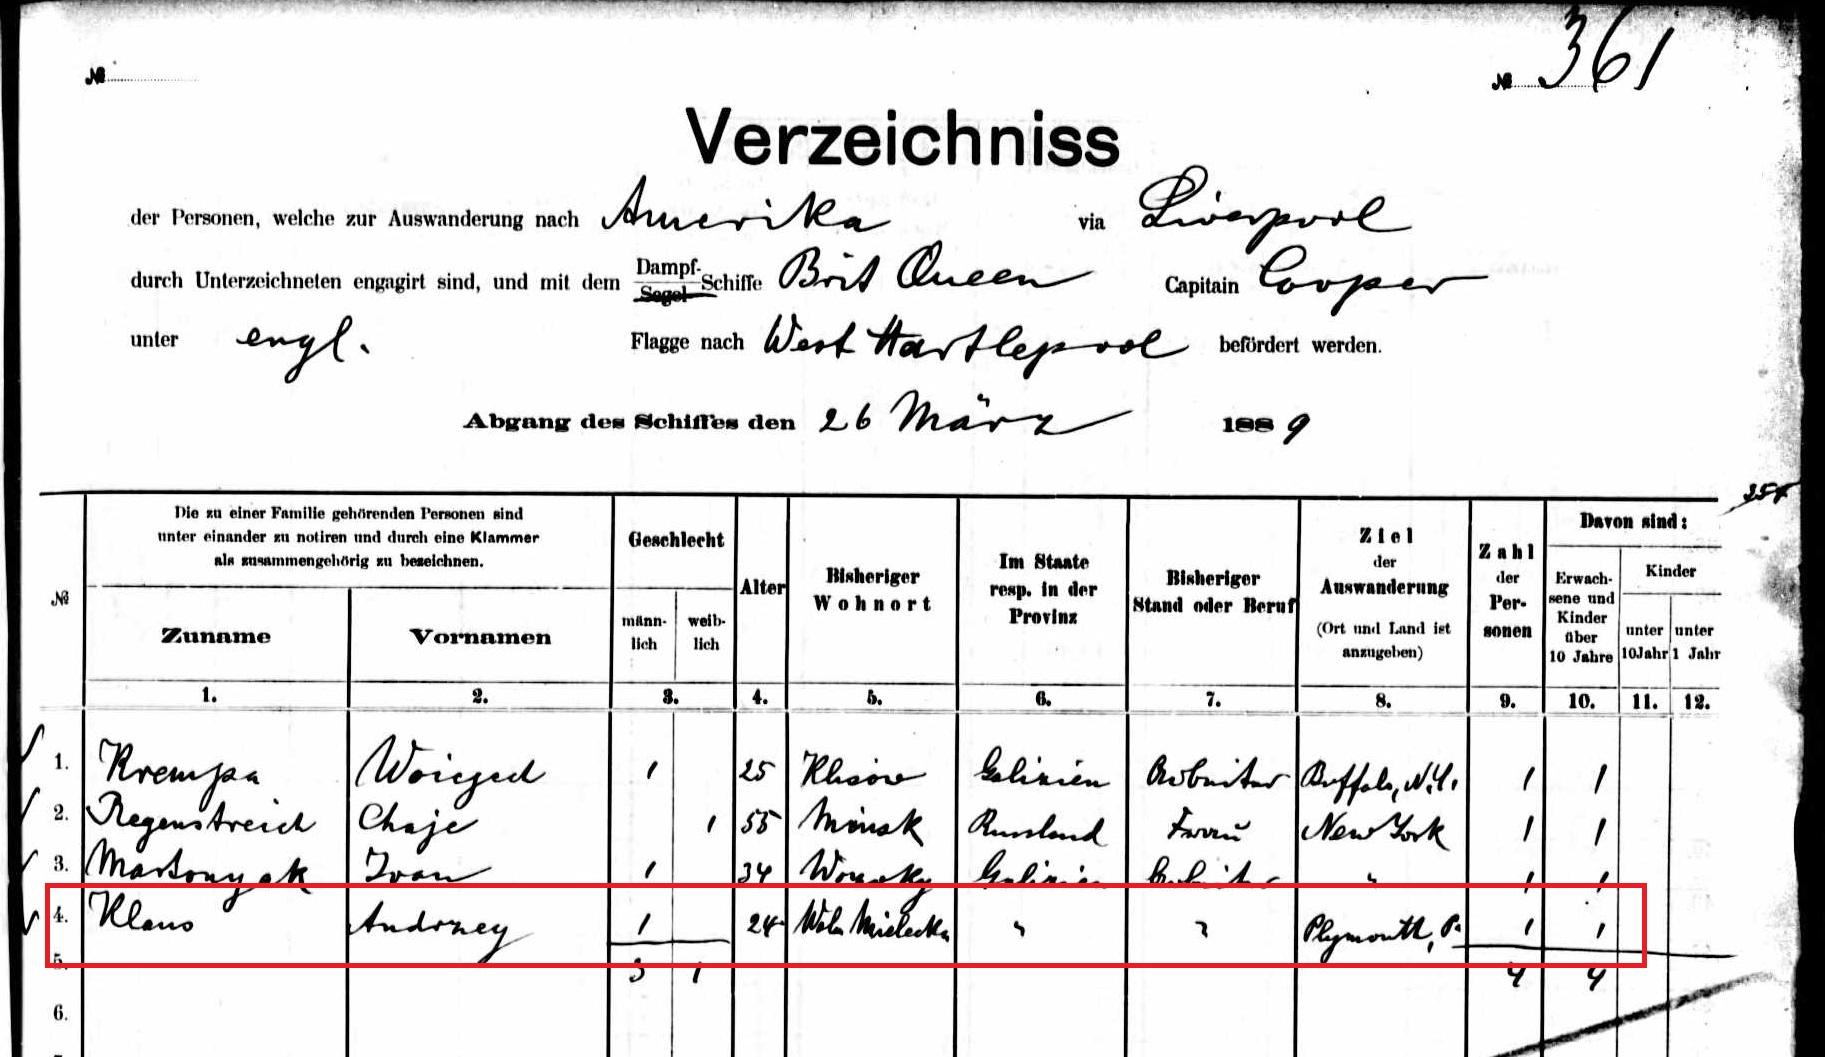 Andrzej Klaus manifest marked 1889